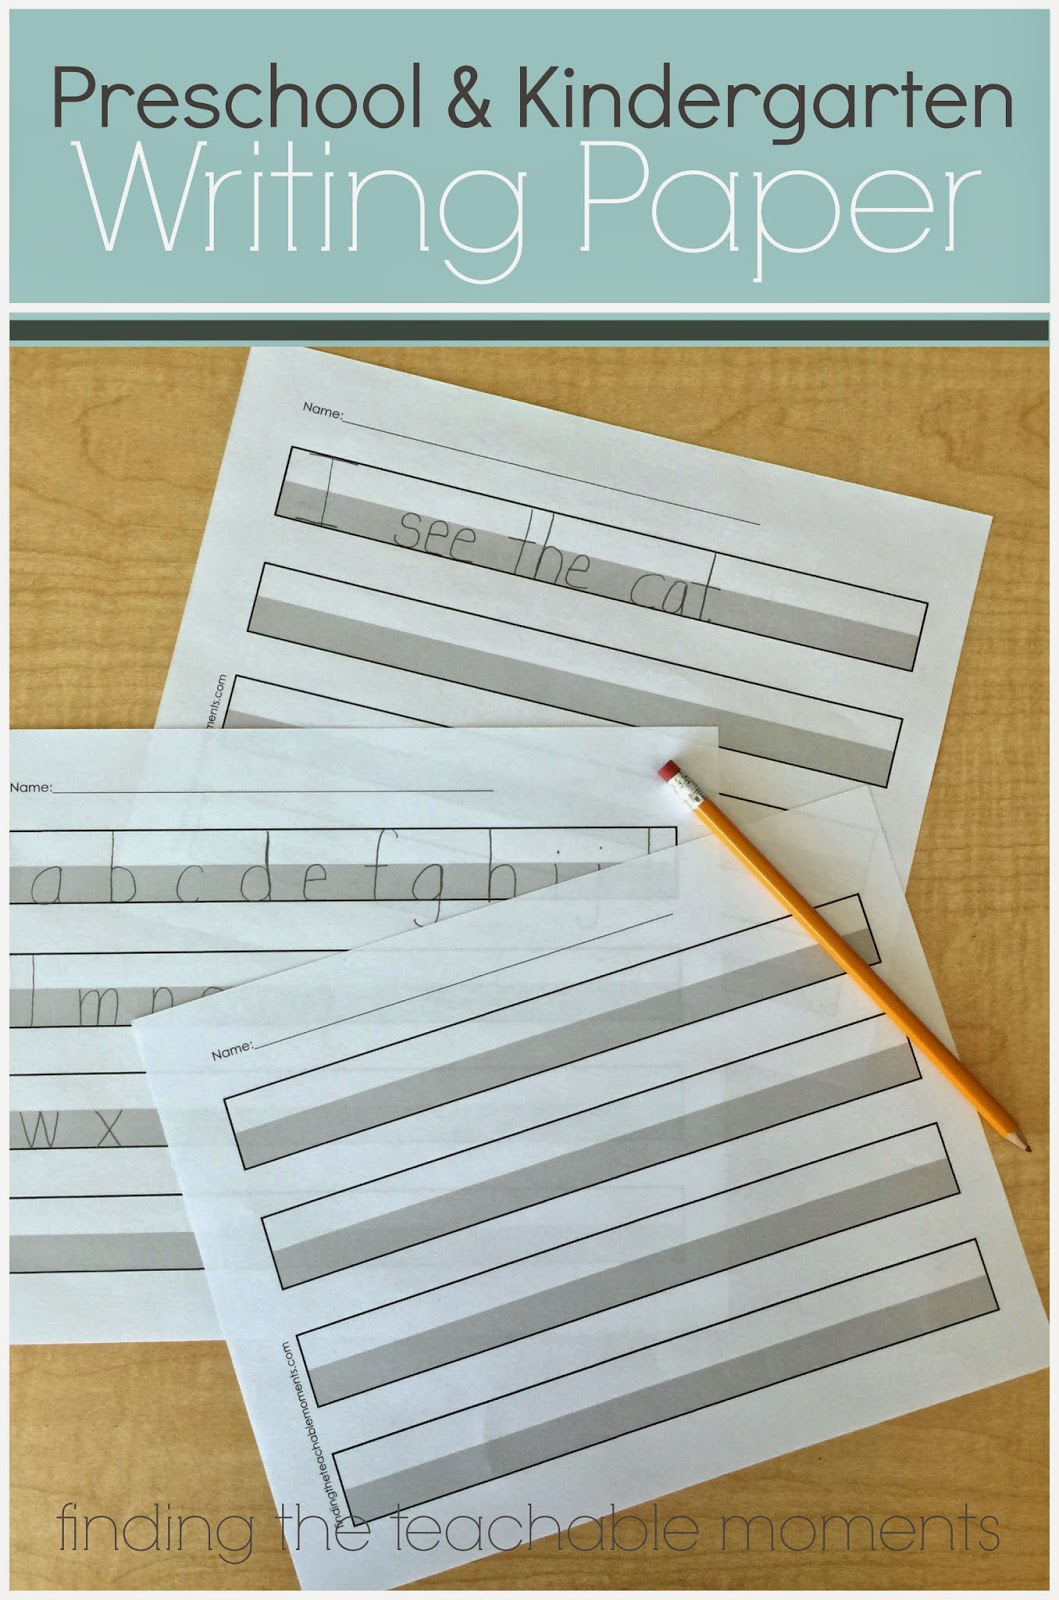 Finding The Teachable Moments Preschool And Kindergarten